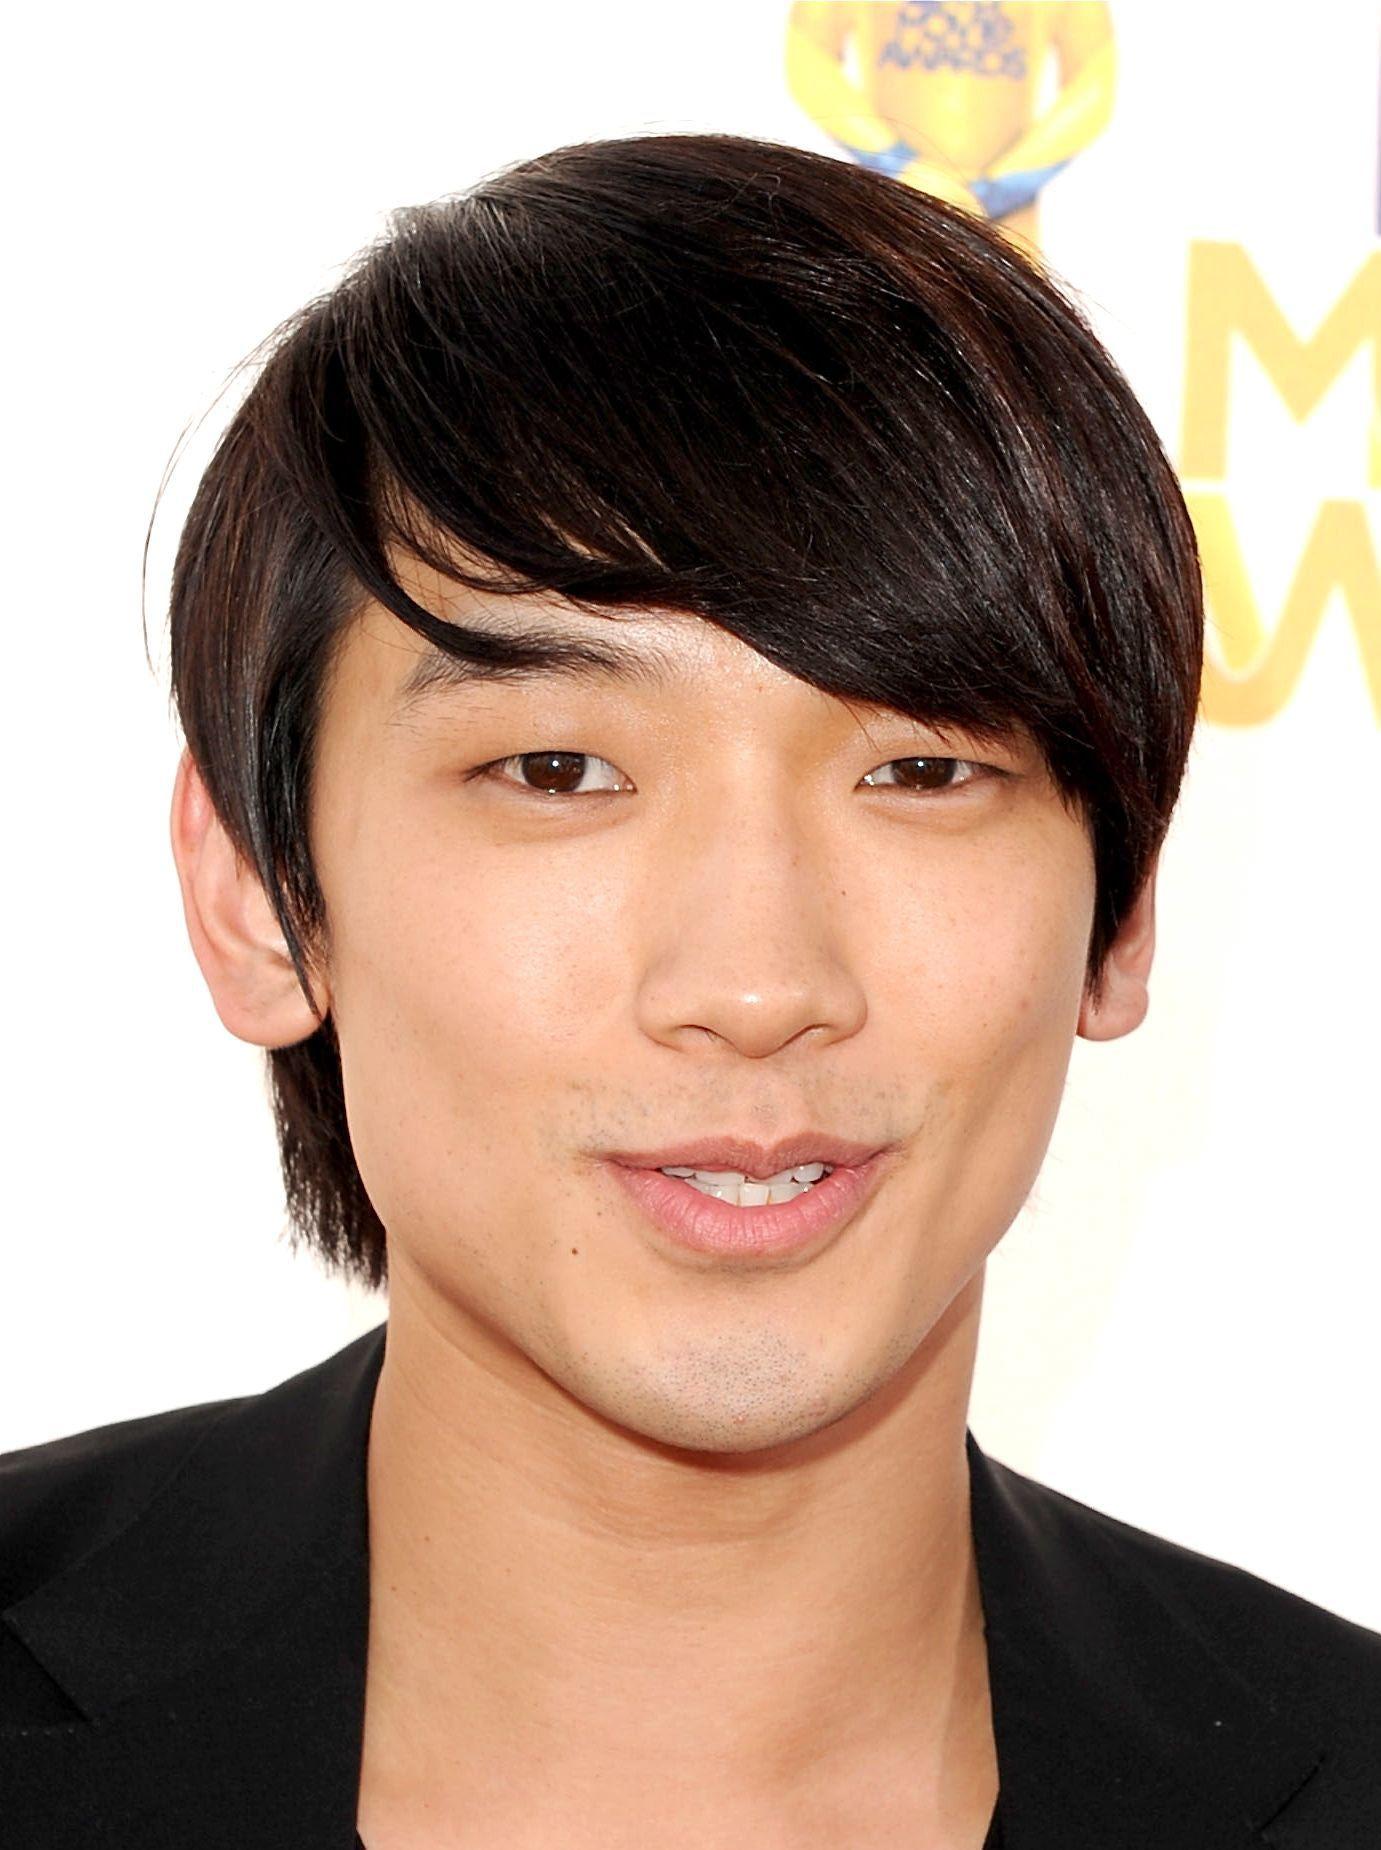 Asian Men Hairstyles Ideas Hairstyles Pinterest Asian Men - Straight hair styles for men